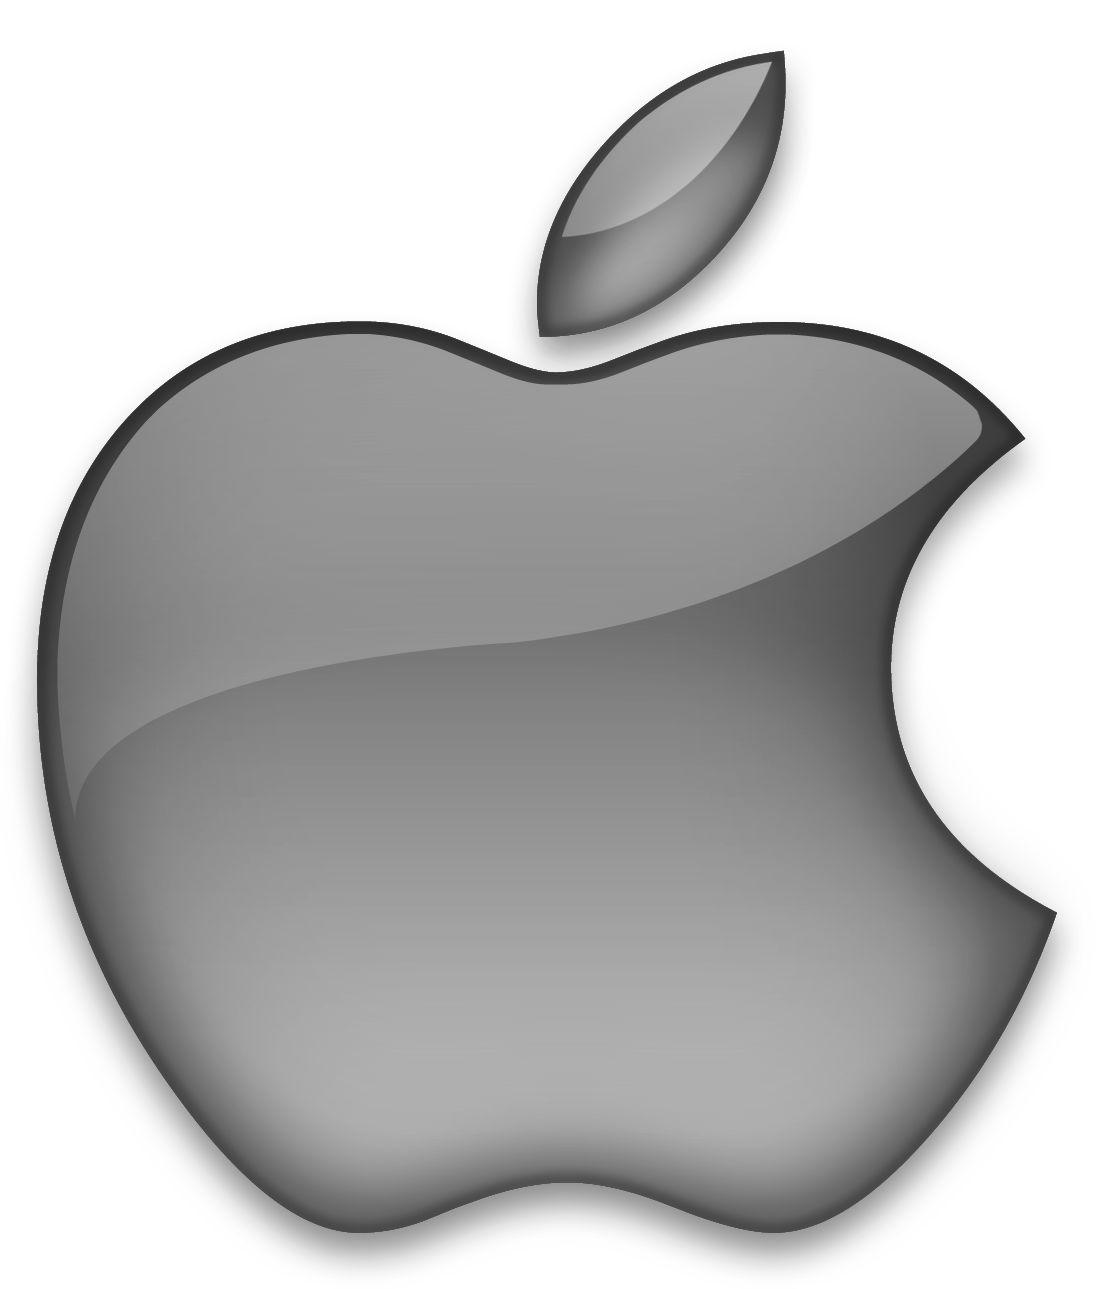 silver-apple-logo-apple-picture.jpg